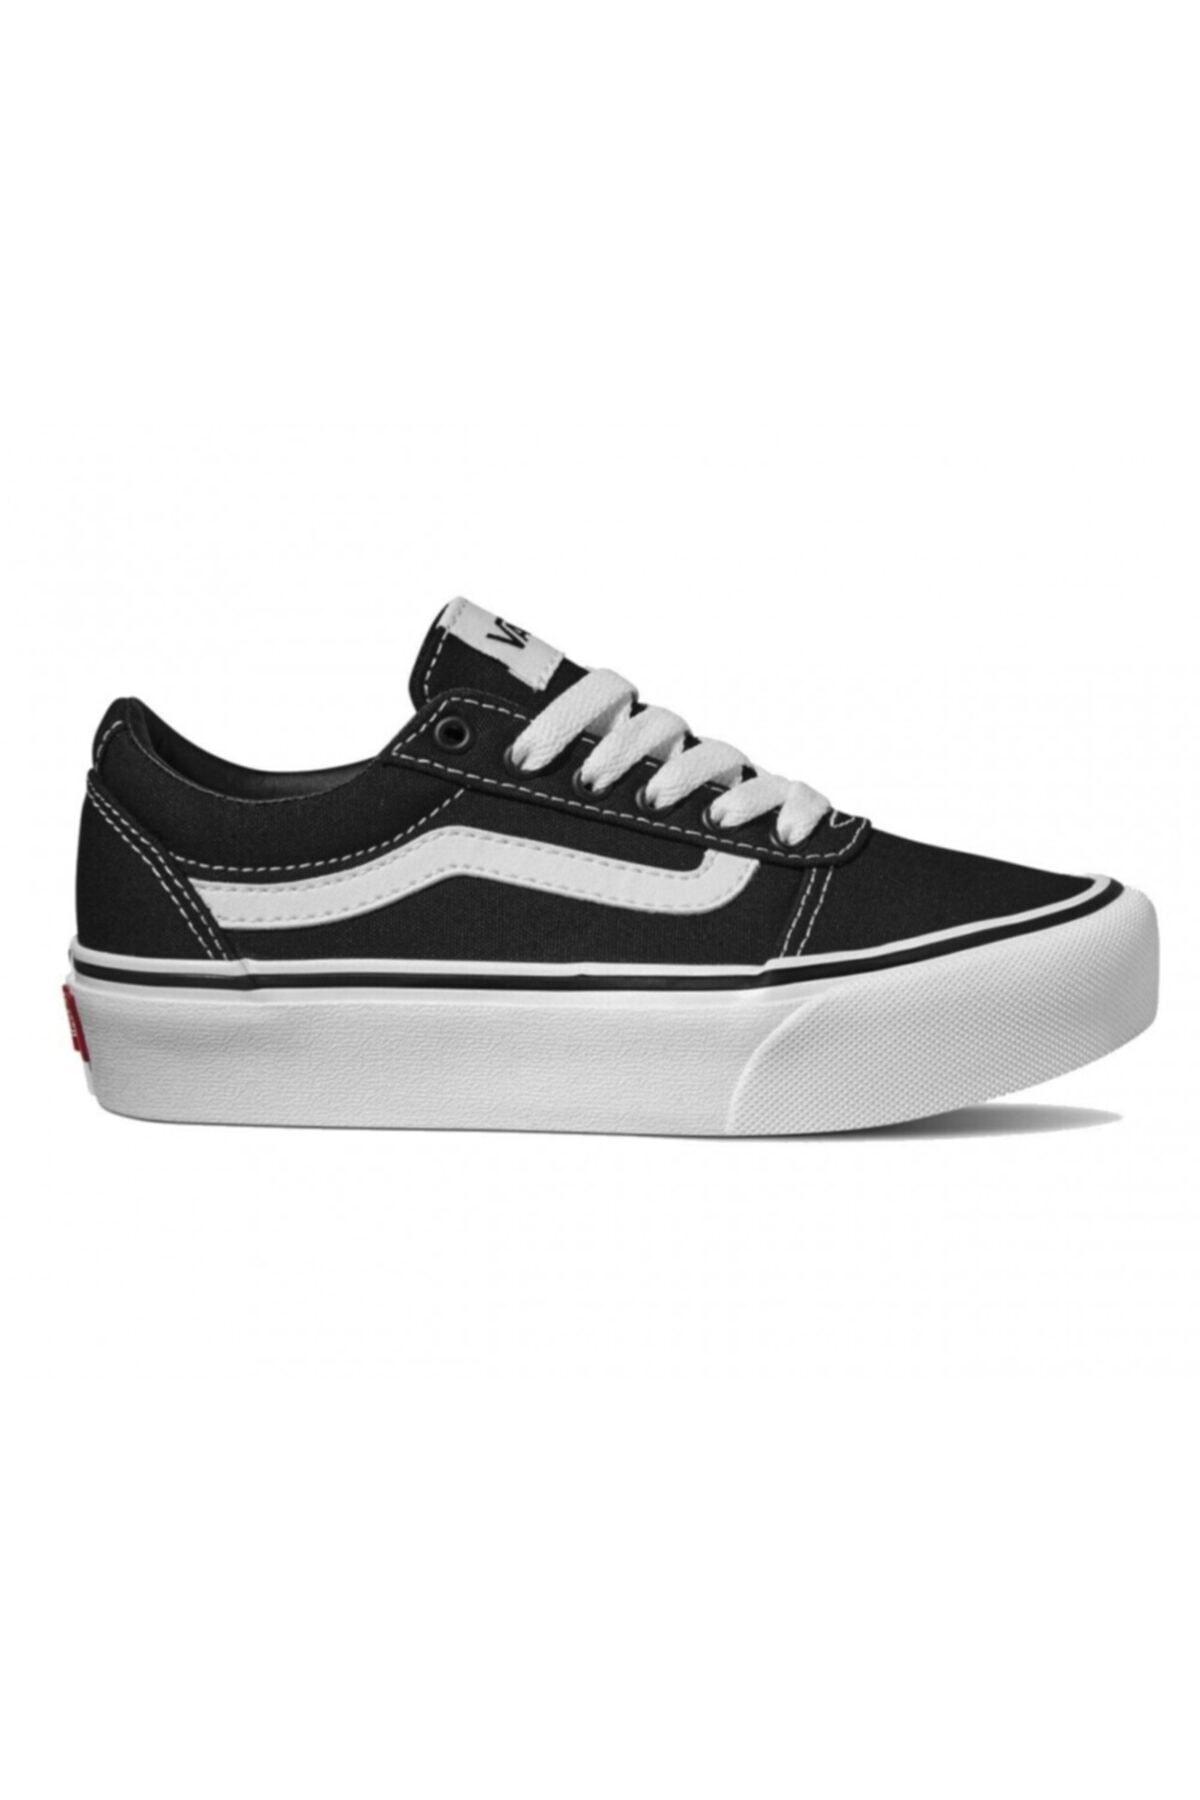 Vans My Ward Platform Kadın Siyah Sneaker Ayakkabı Vn0a4uuv1871 1